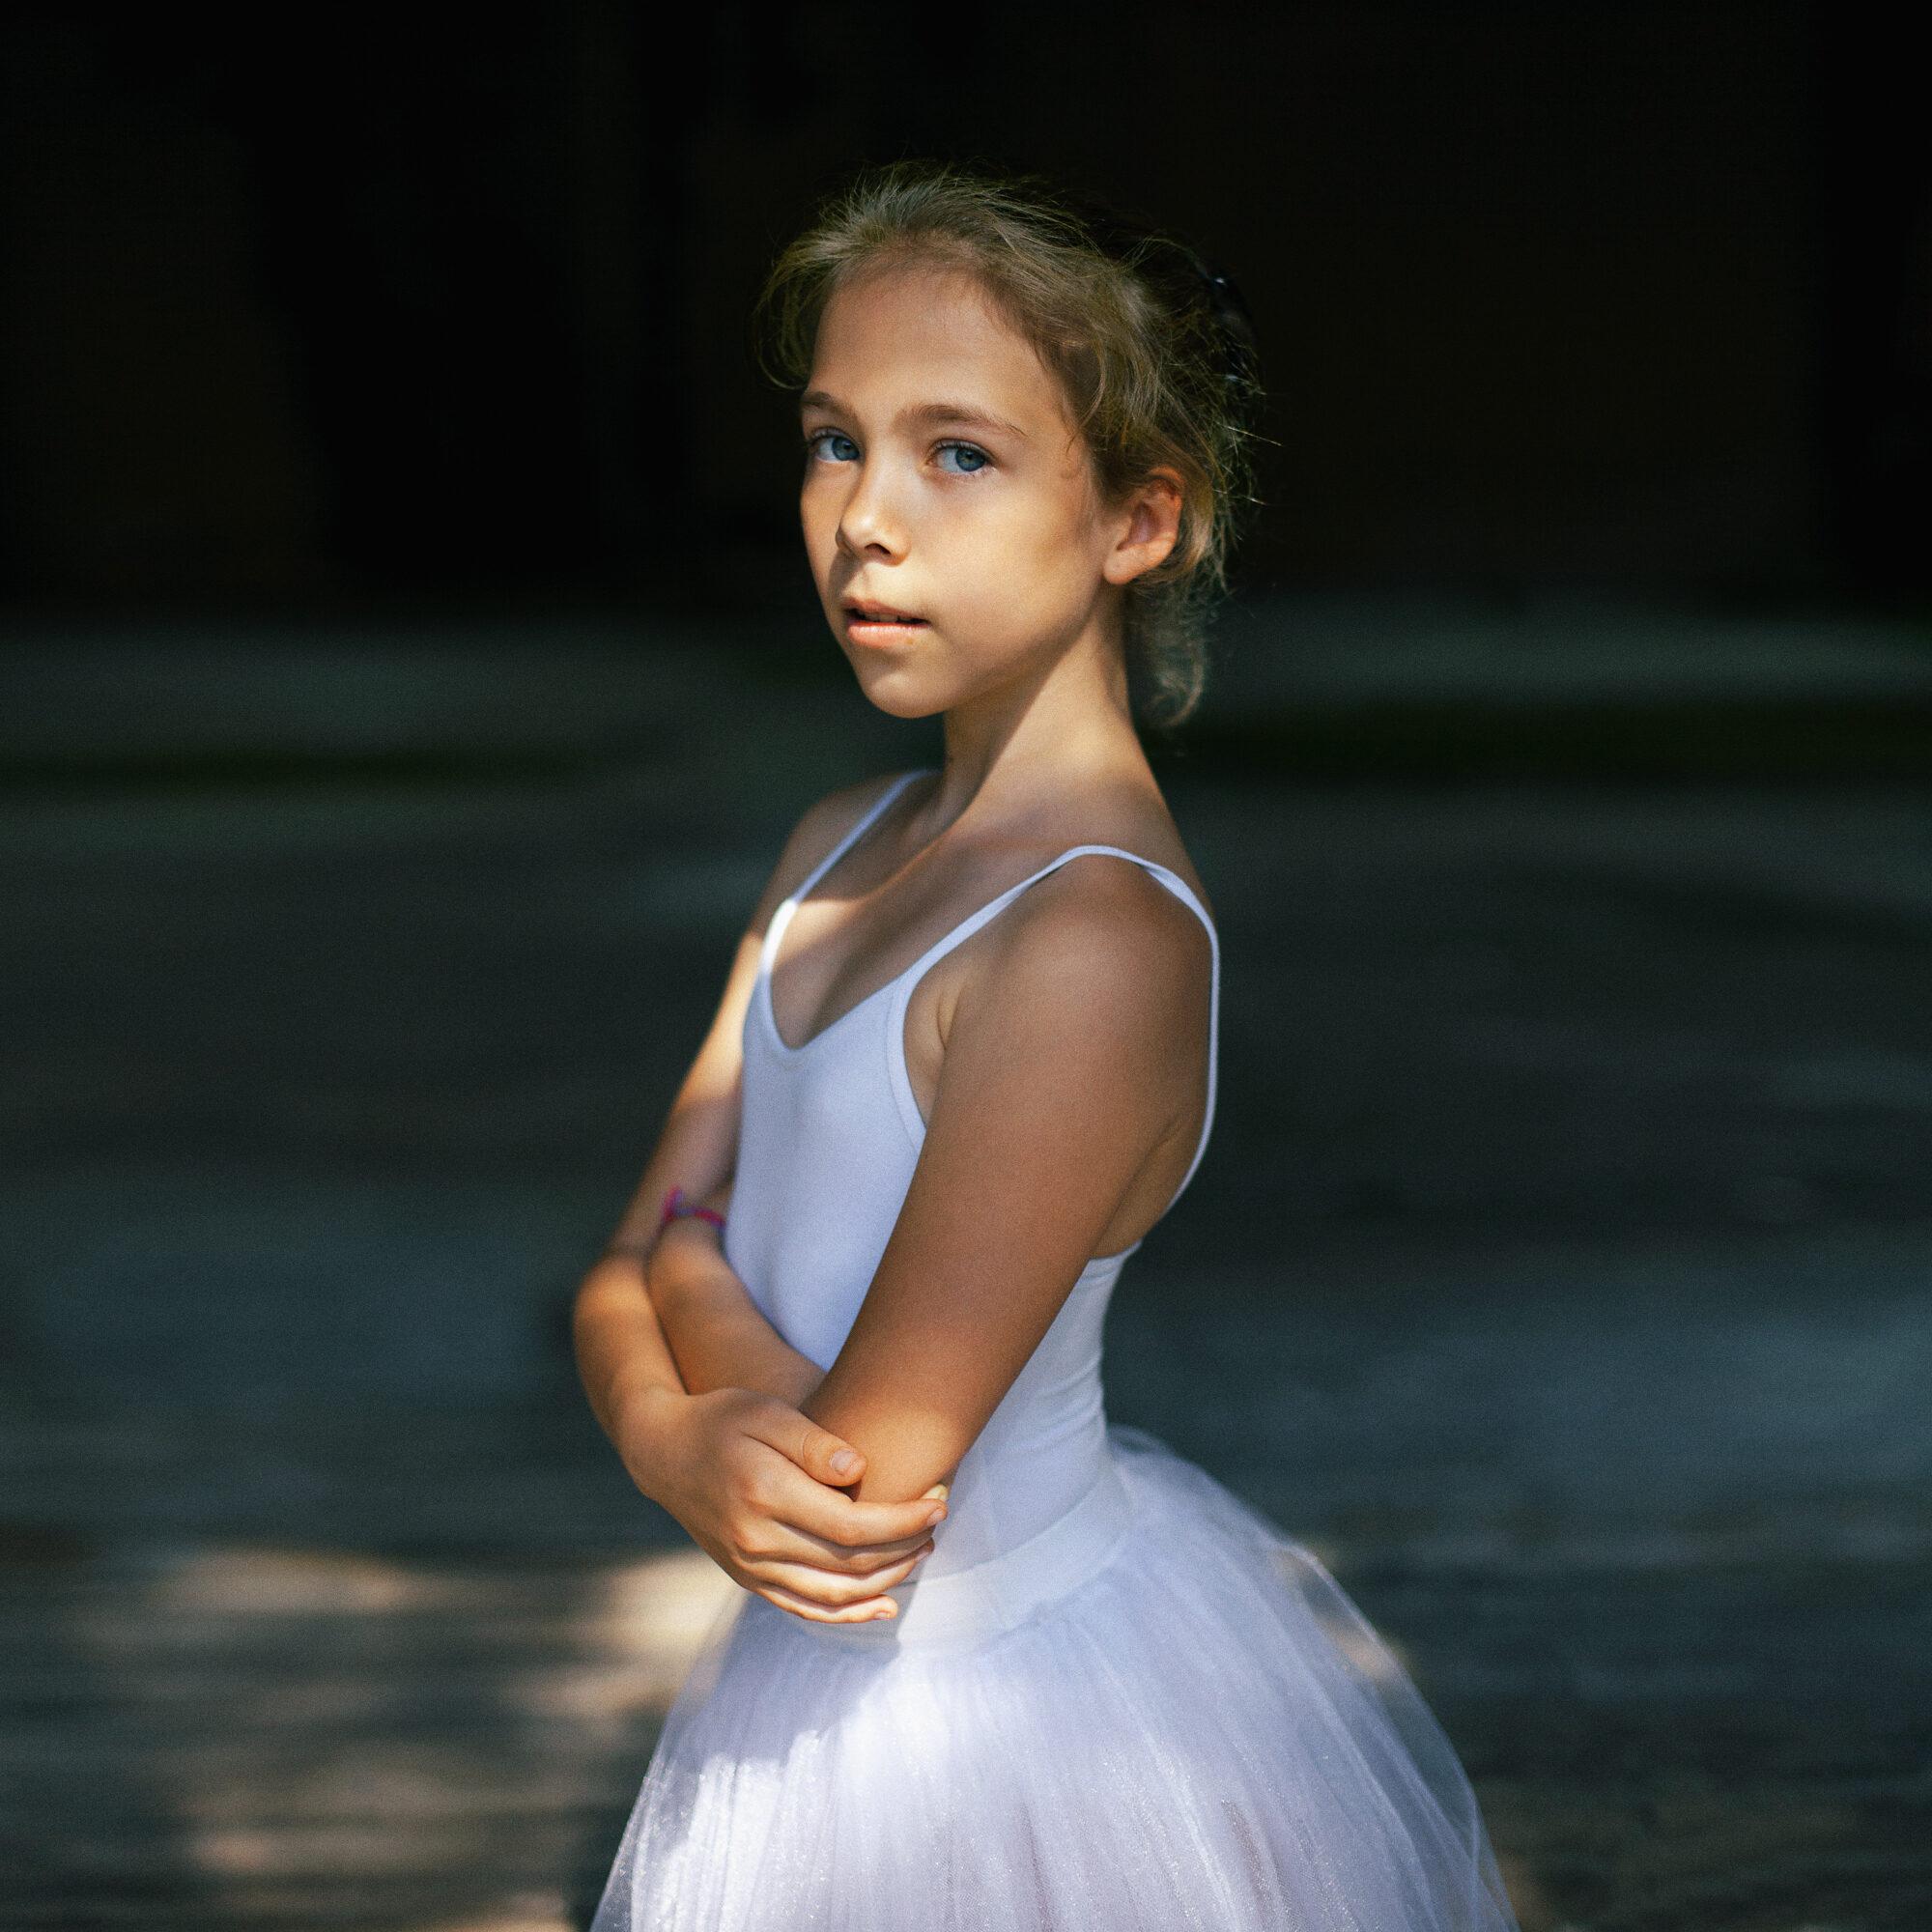 masha_ballet_zal_008-2000x2000.jpg